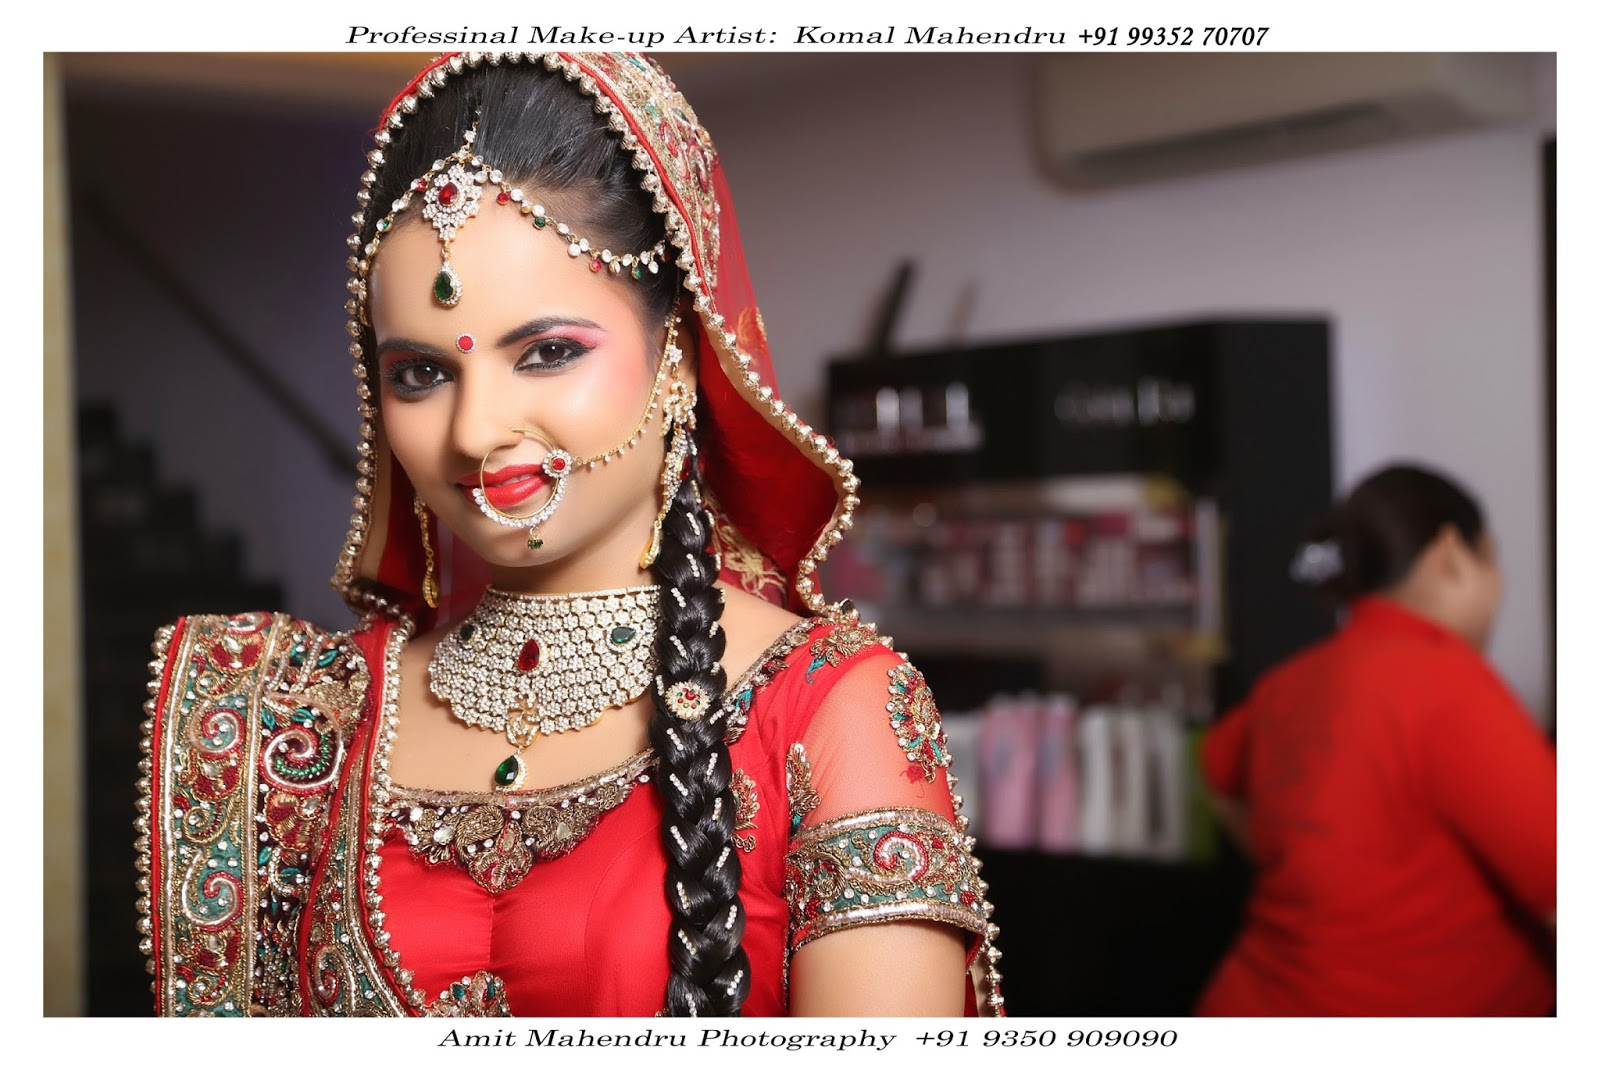 Komal mahendru s professional makeup lucknow india bridal makeup - Https Www Facebook Com Komal Mahendru Professional Makeup